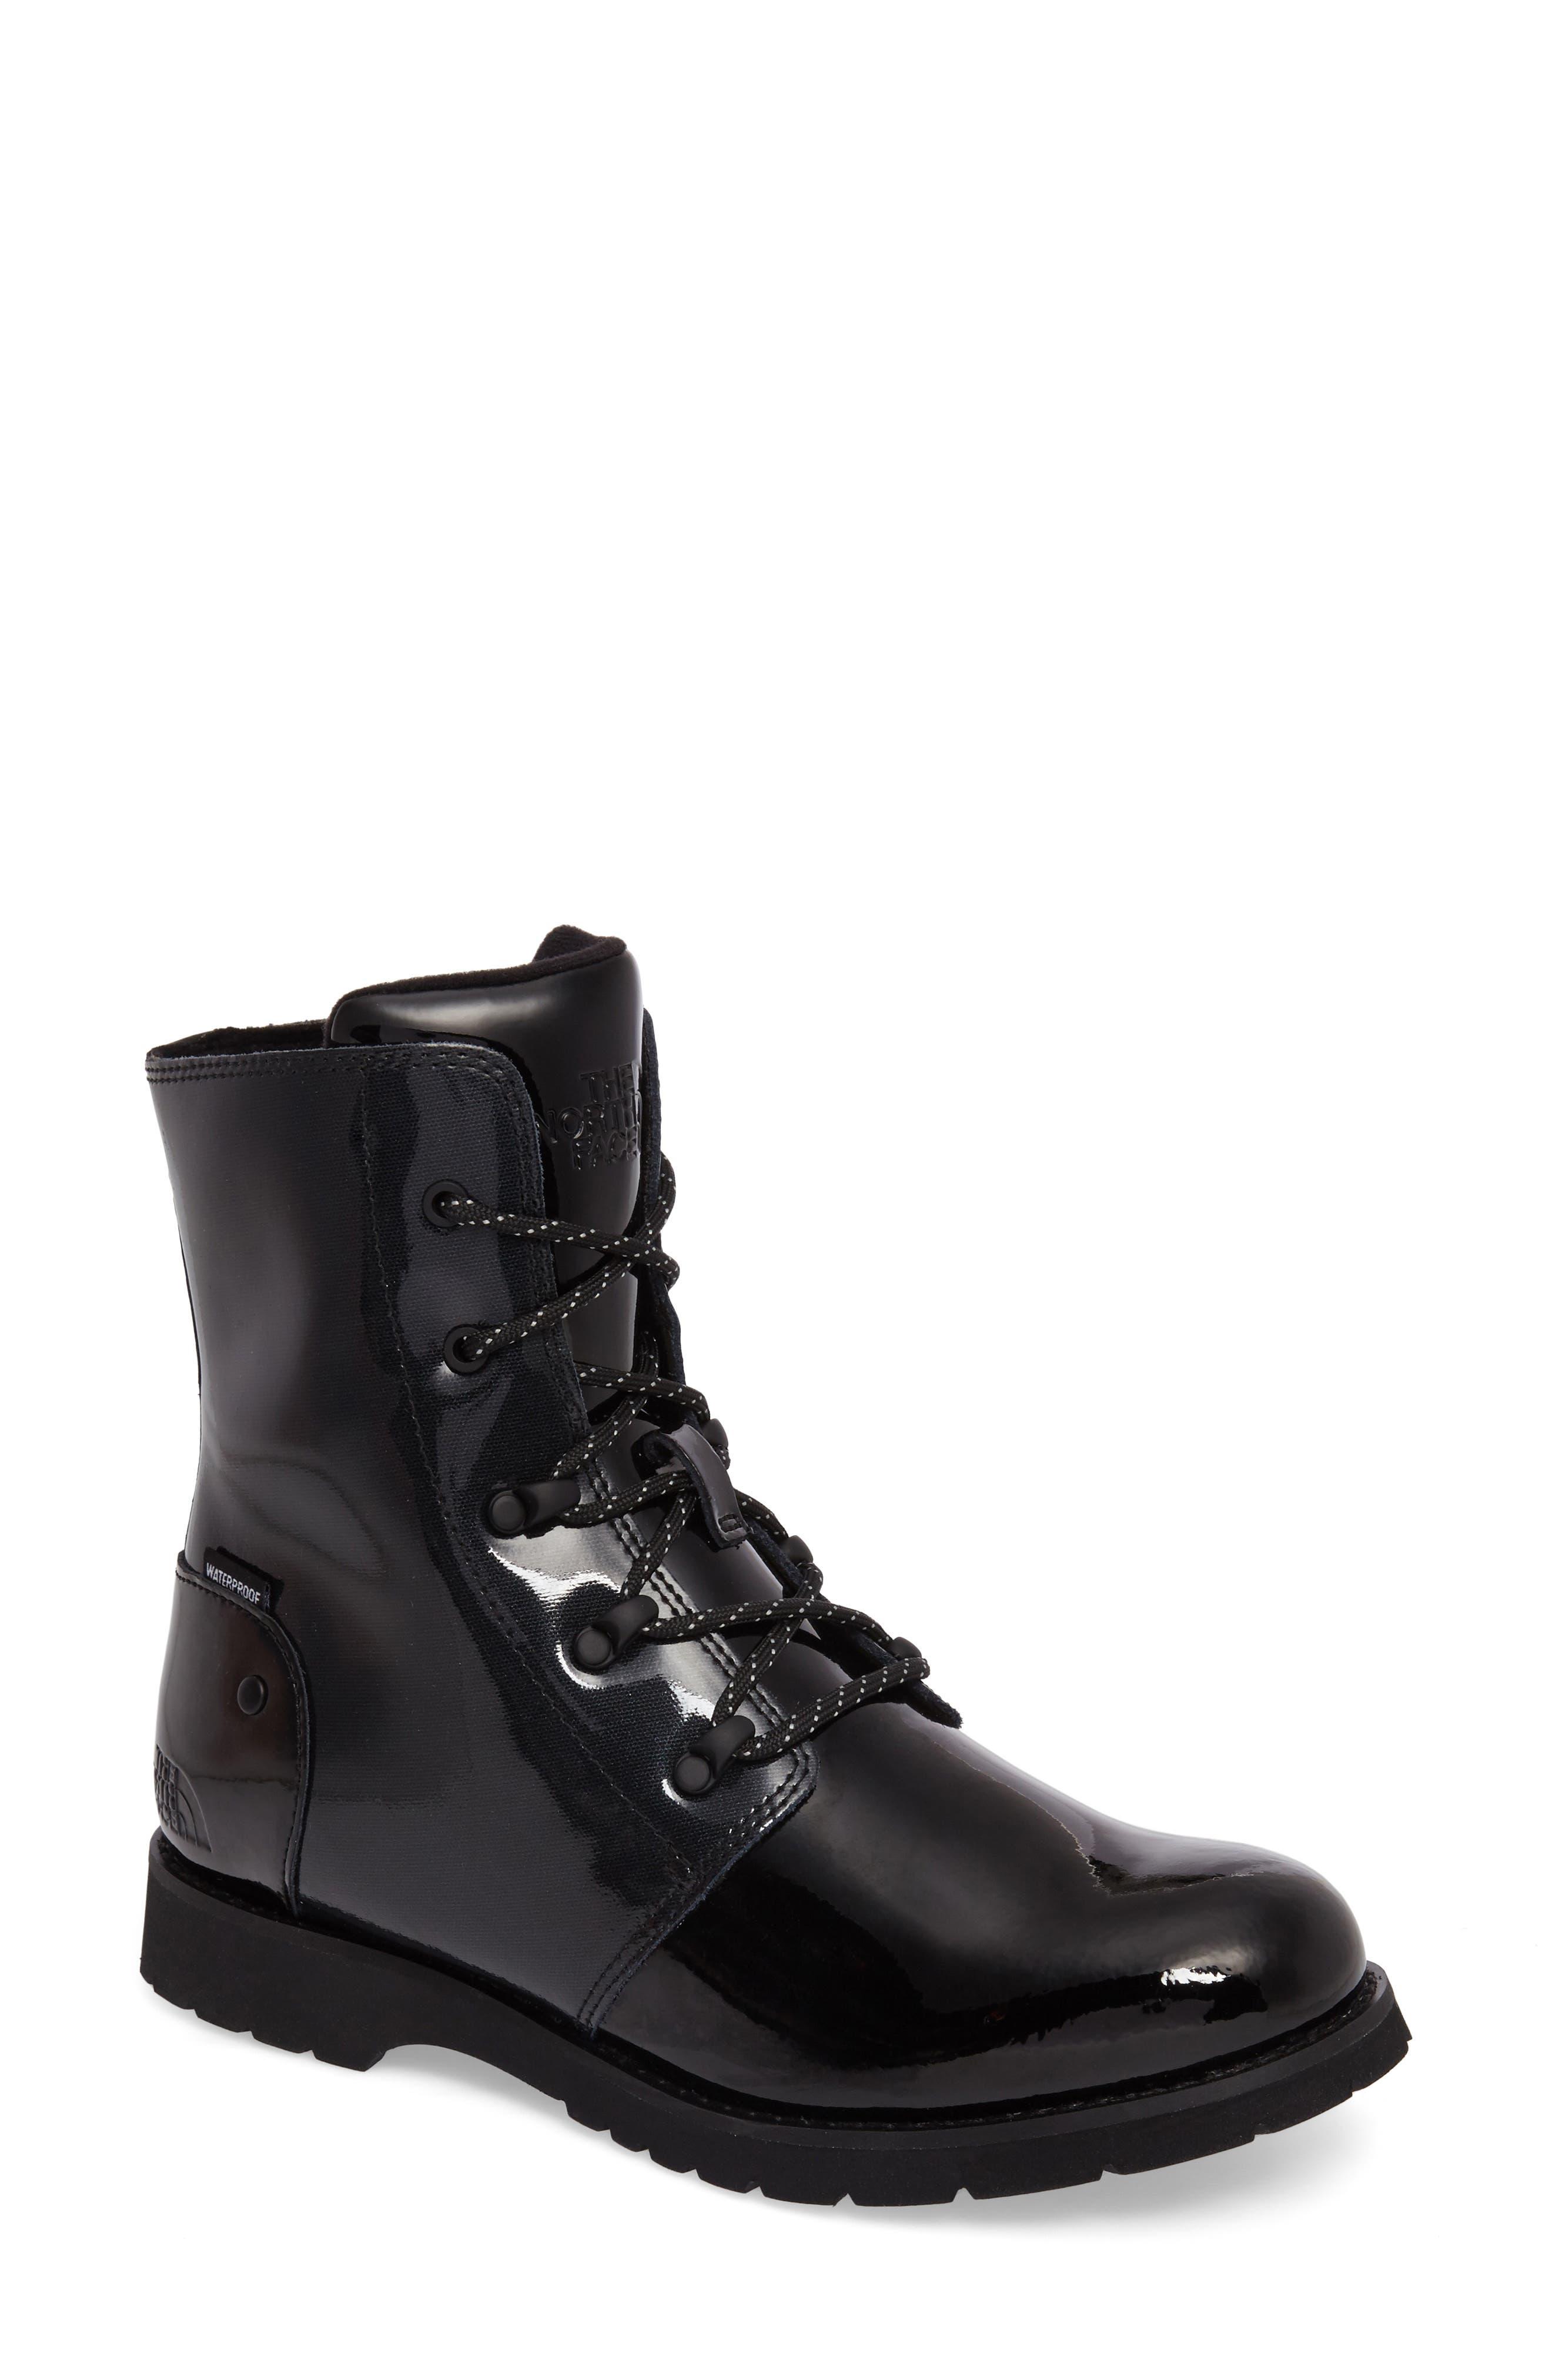 Alternate Image 1 Selected - The North Face Ballard Rain Boot (Women)